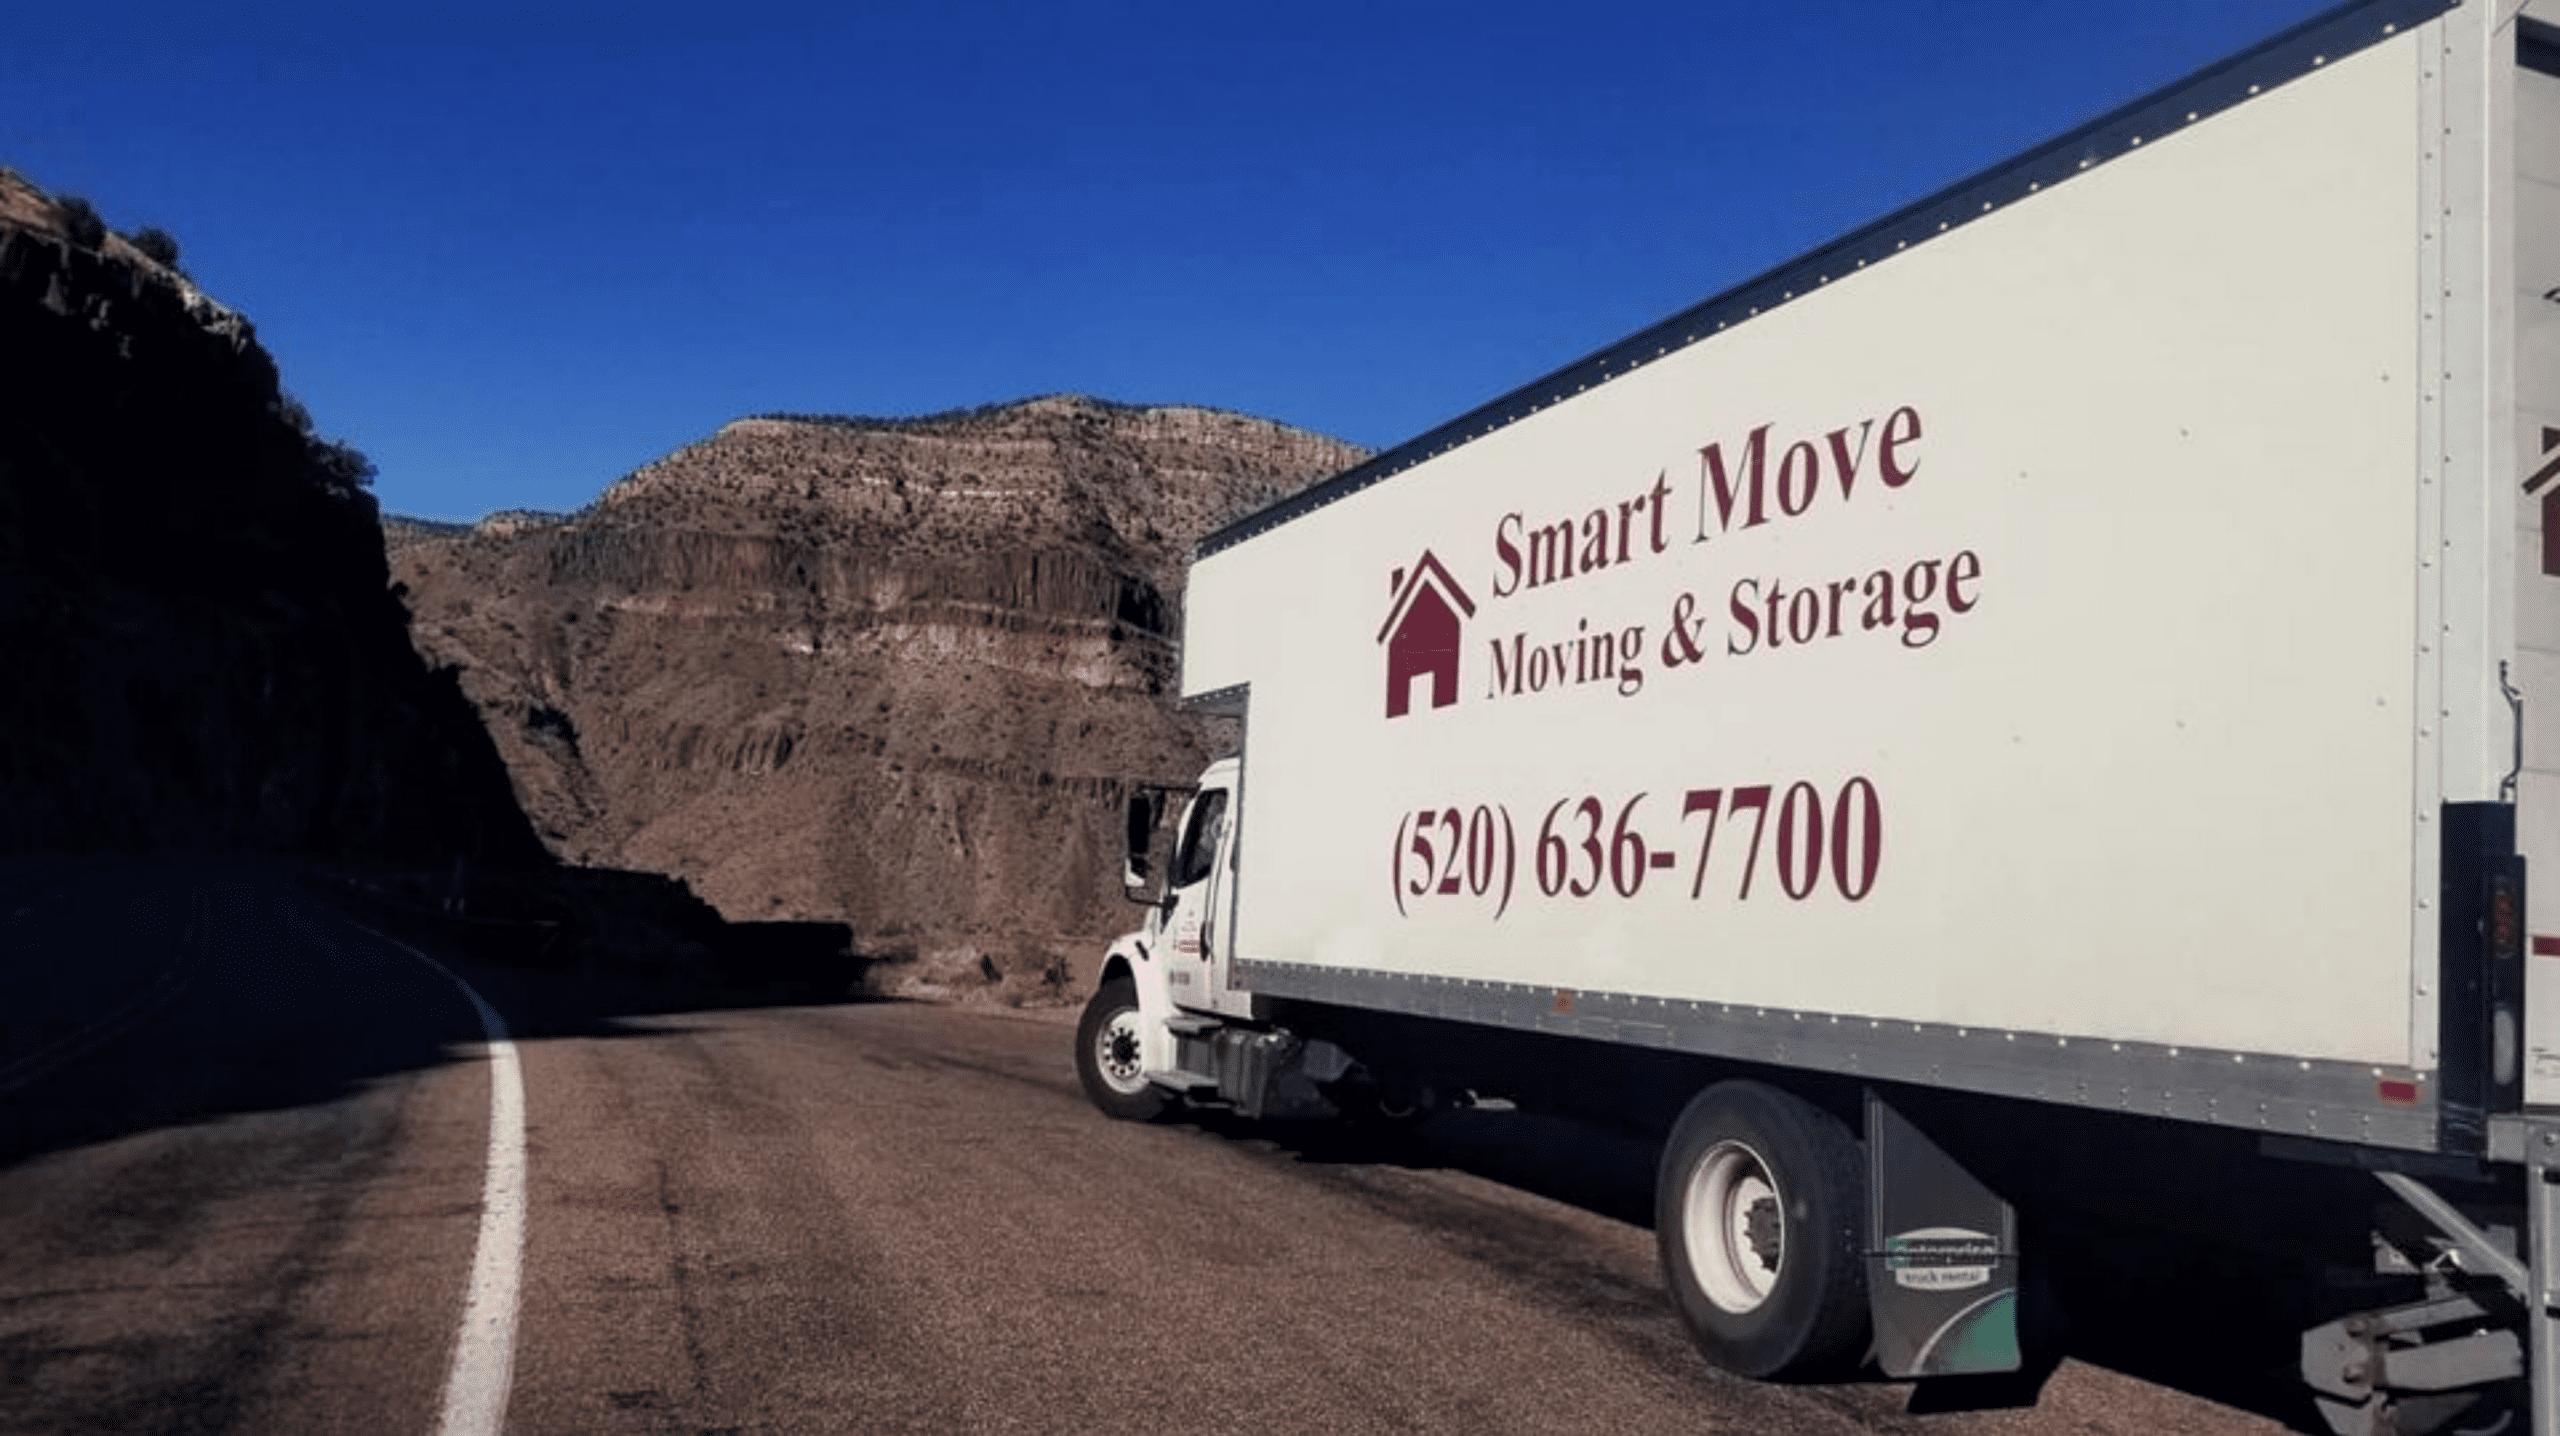 Smart Move Tucson